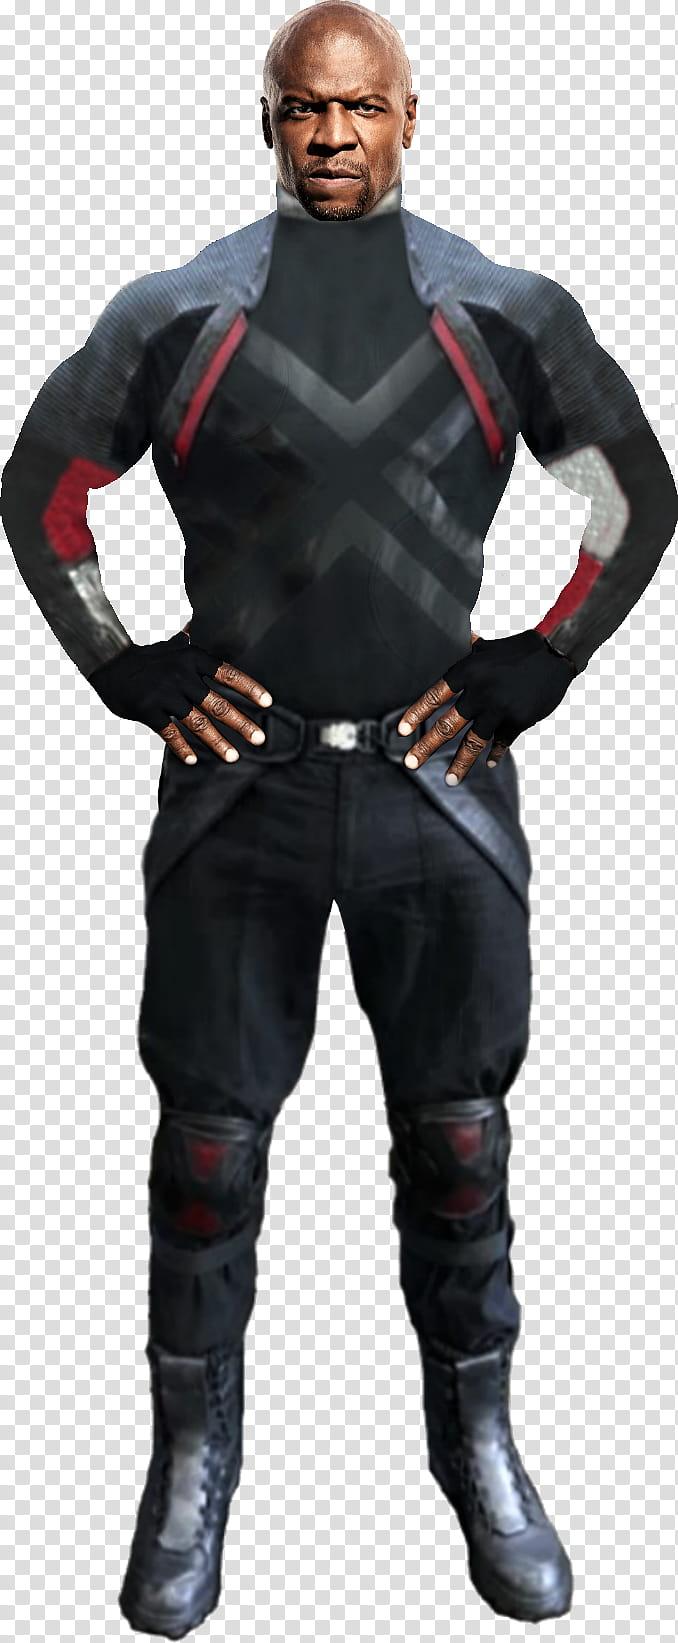 Deadpool Bedlam man in black suit transparent background PNG 678x1643